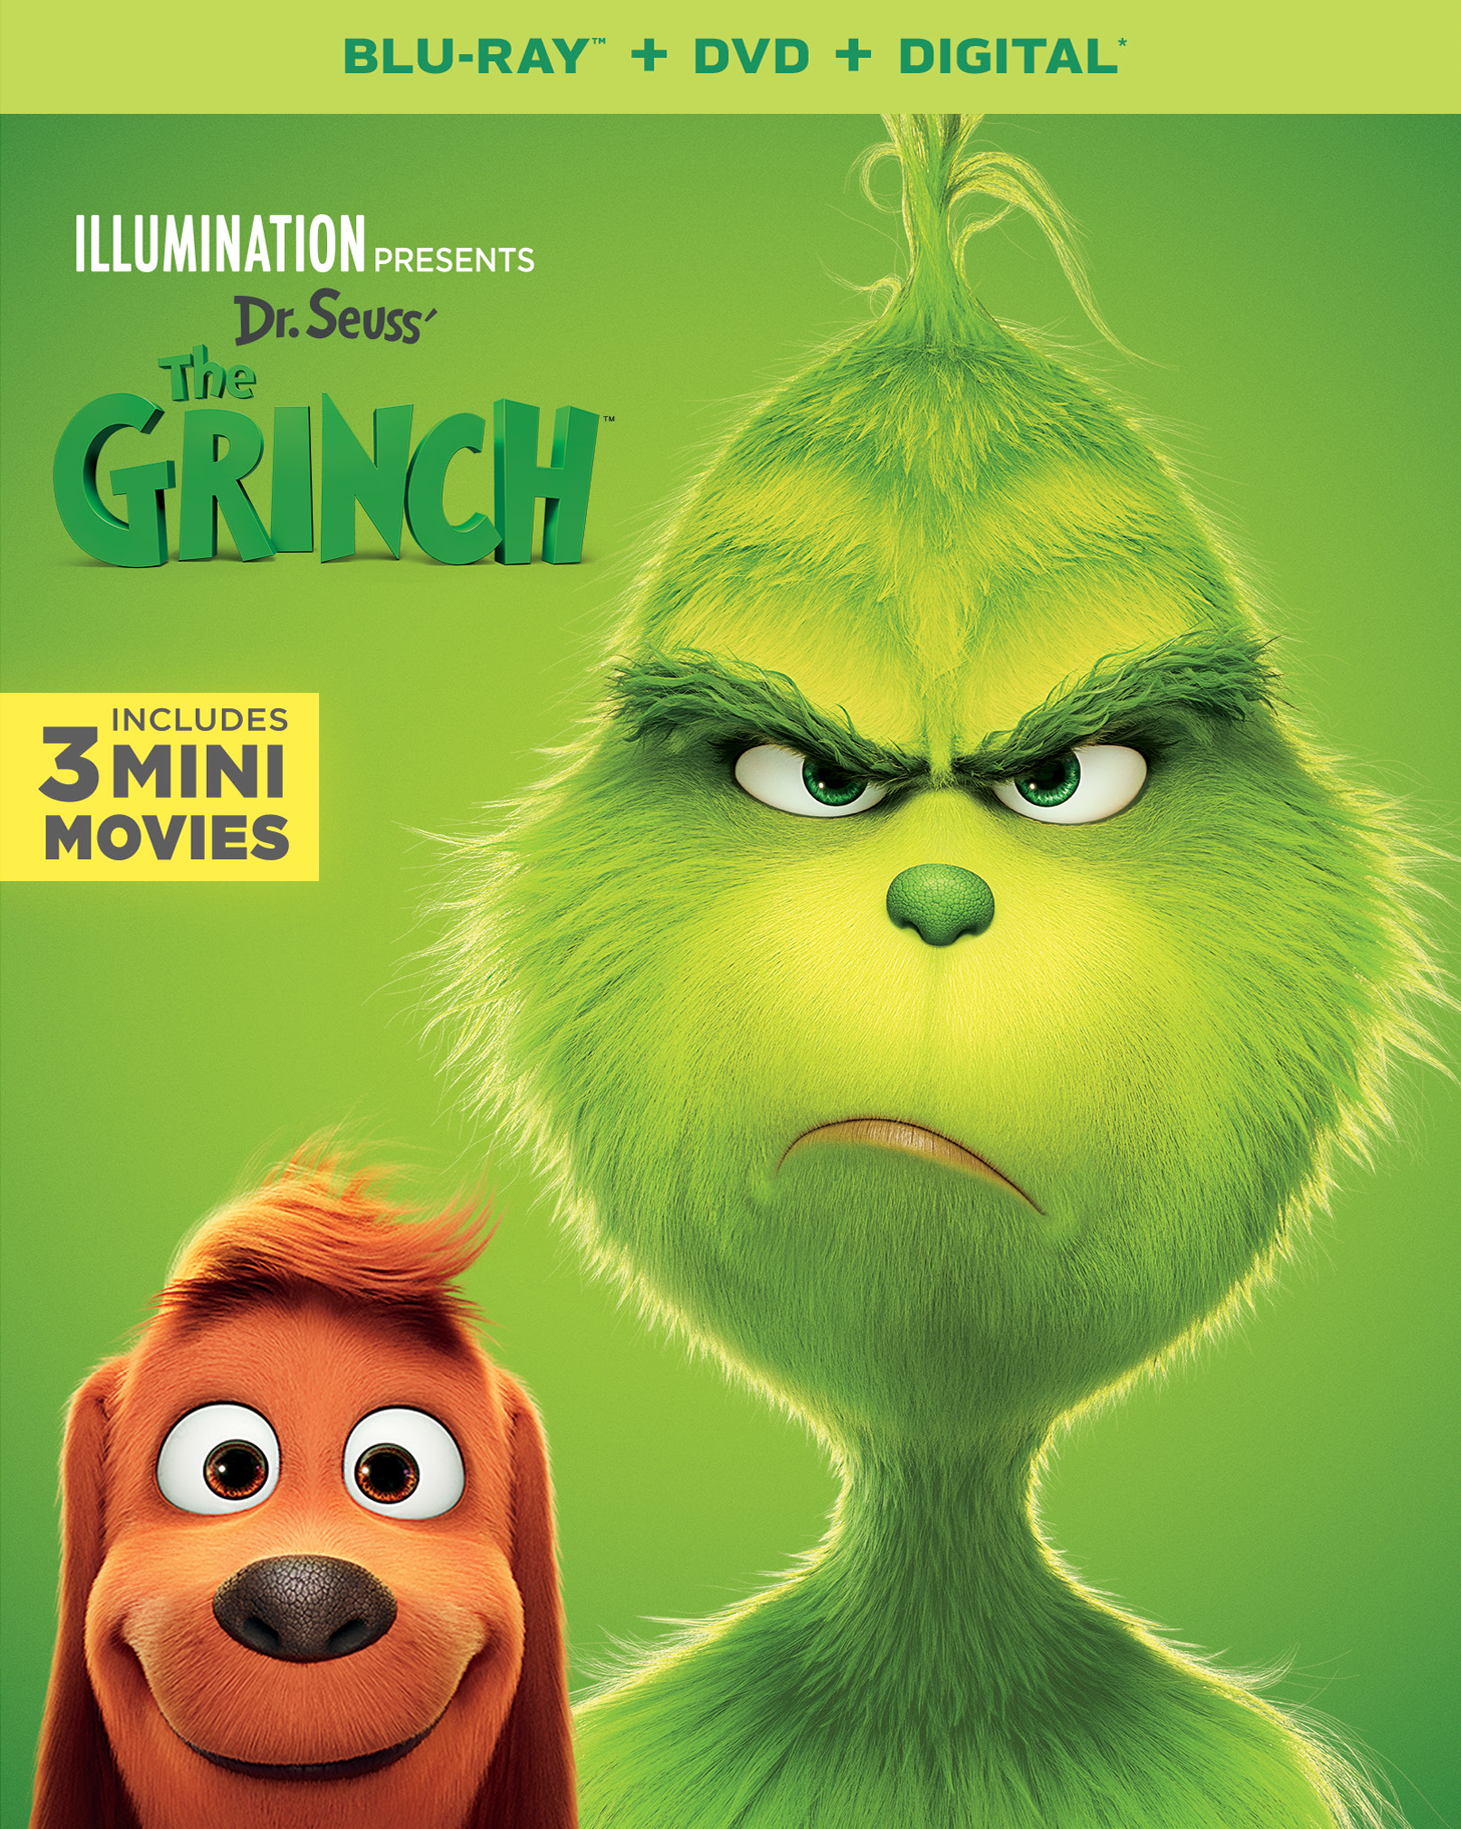 Dr Seuss The Grinch On Digital Jan 22nd On Blu Ray And Dvd Feb 5th The Grinch Dvd The Grinch Movie Grinch